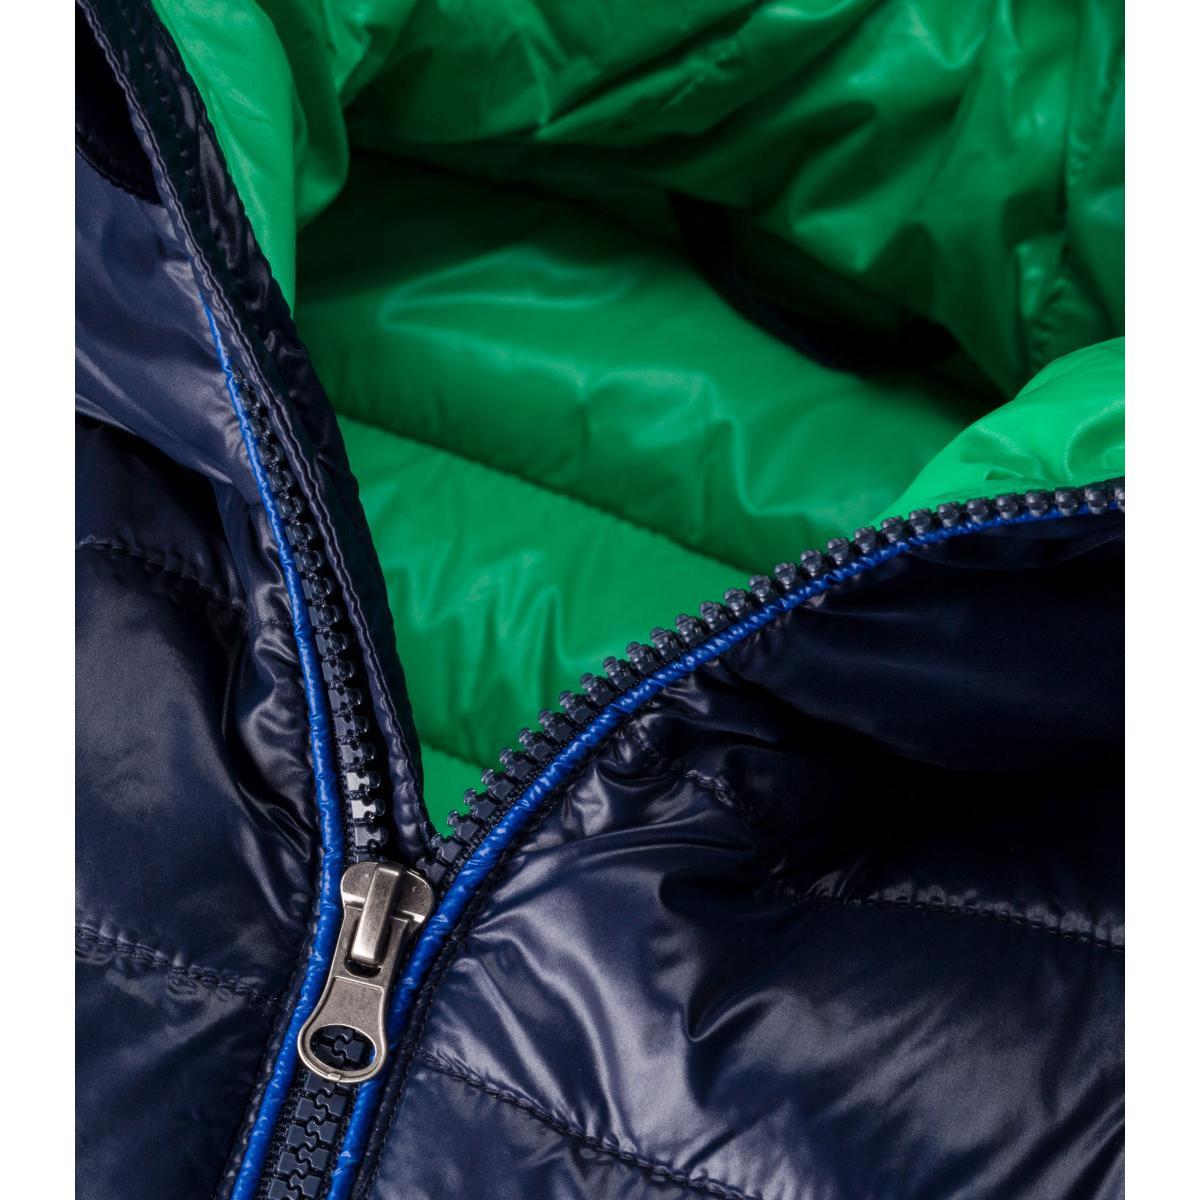 Giubbotto Piumino North Sails da Uomo North Super Light Hooded Jacket Rif. 6024660000802